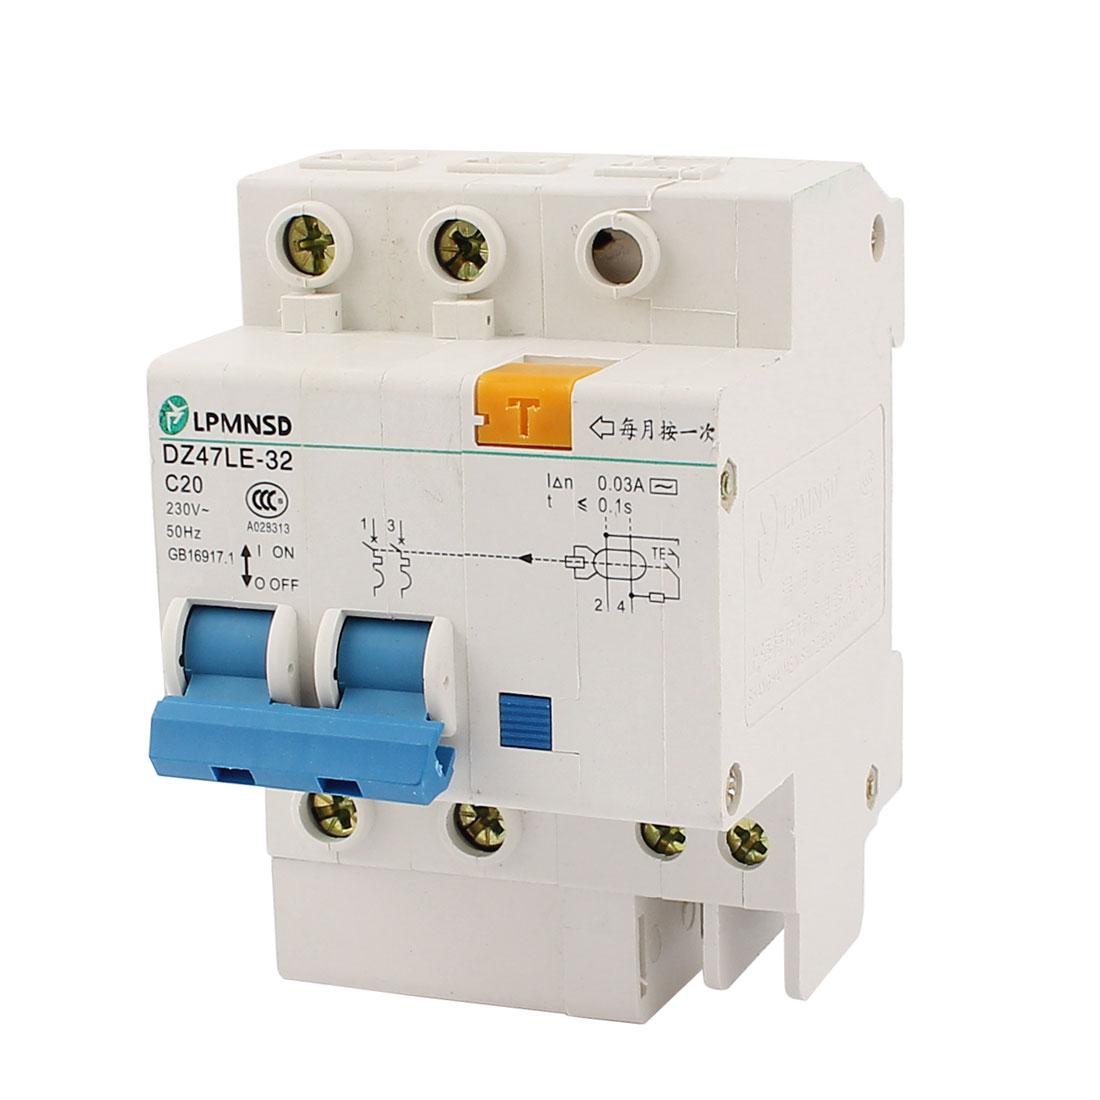 AC 230V 20A DZ47LE-32 C20 2 Pole Overload Protector Mini Circuit Breaker